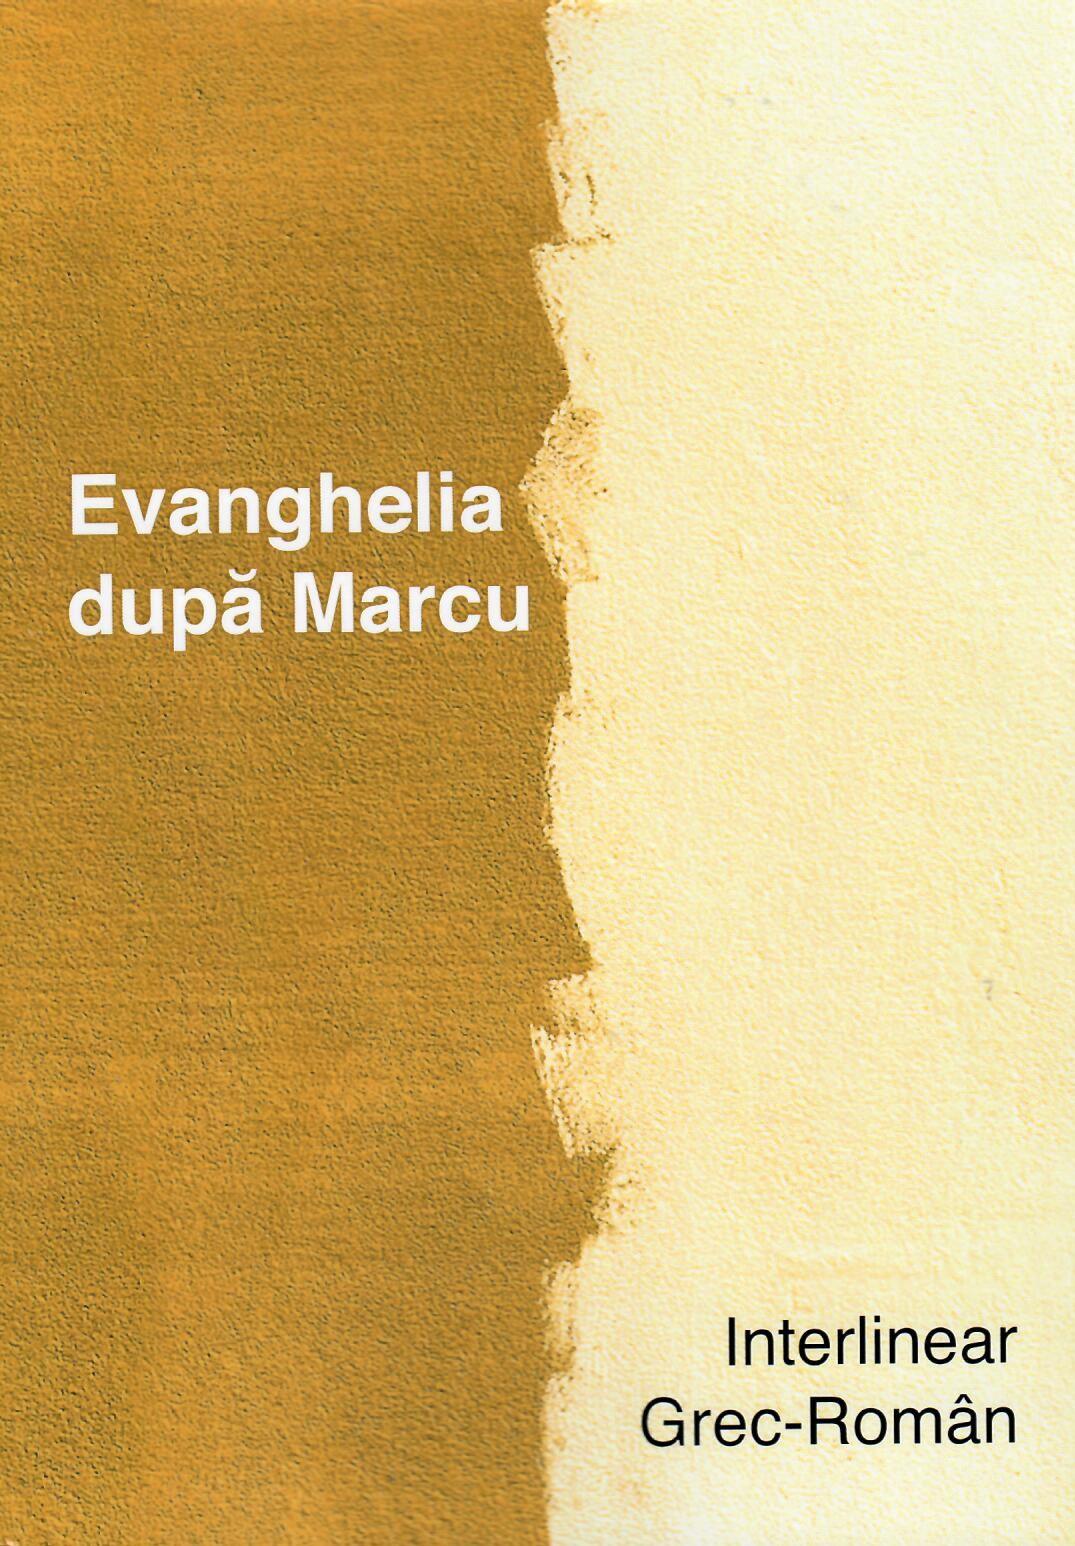 Evanghelia dupa Marcu interlinear